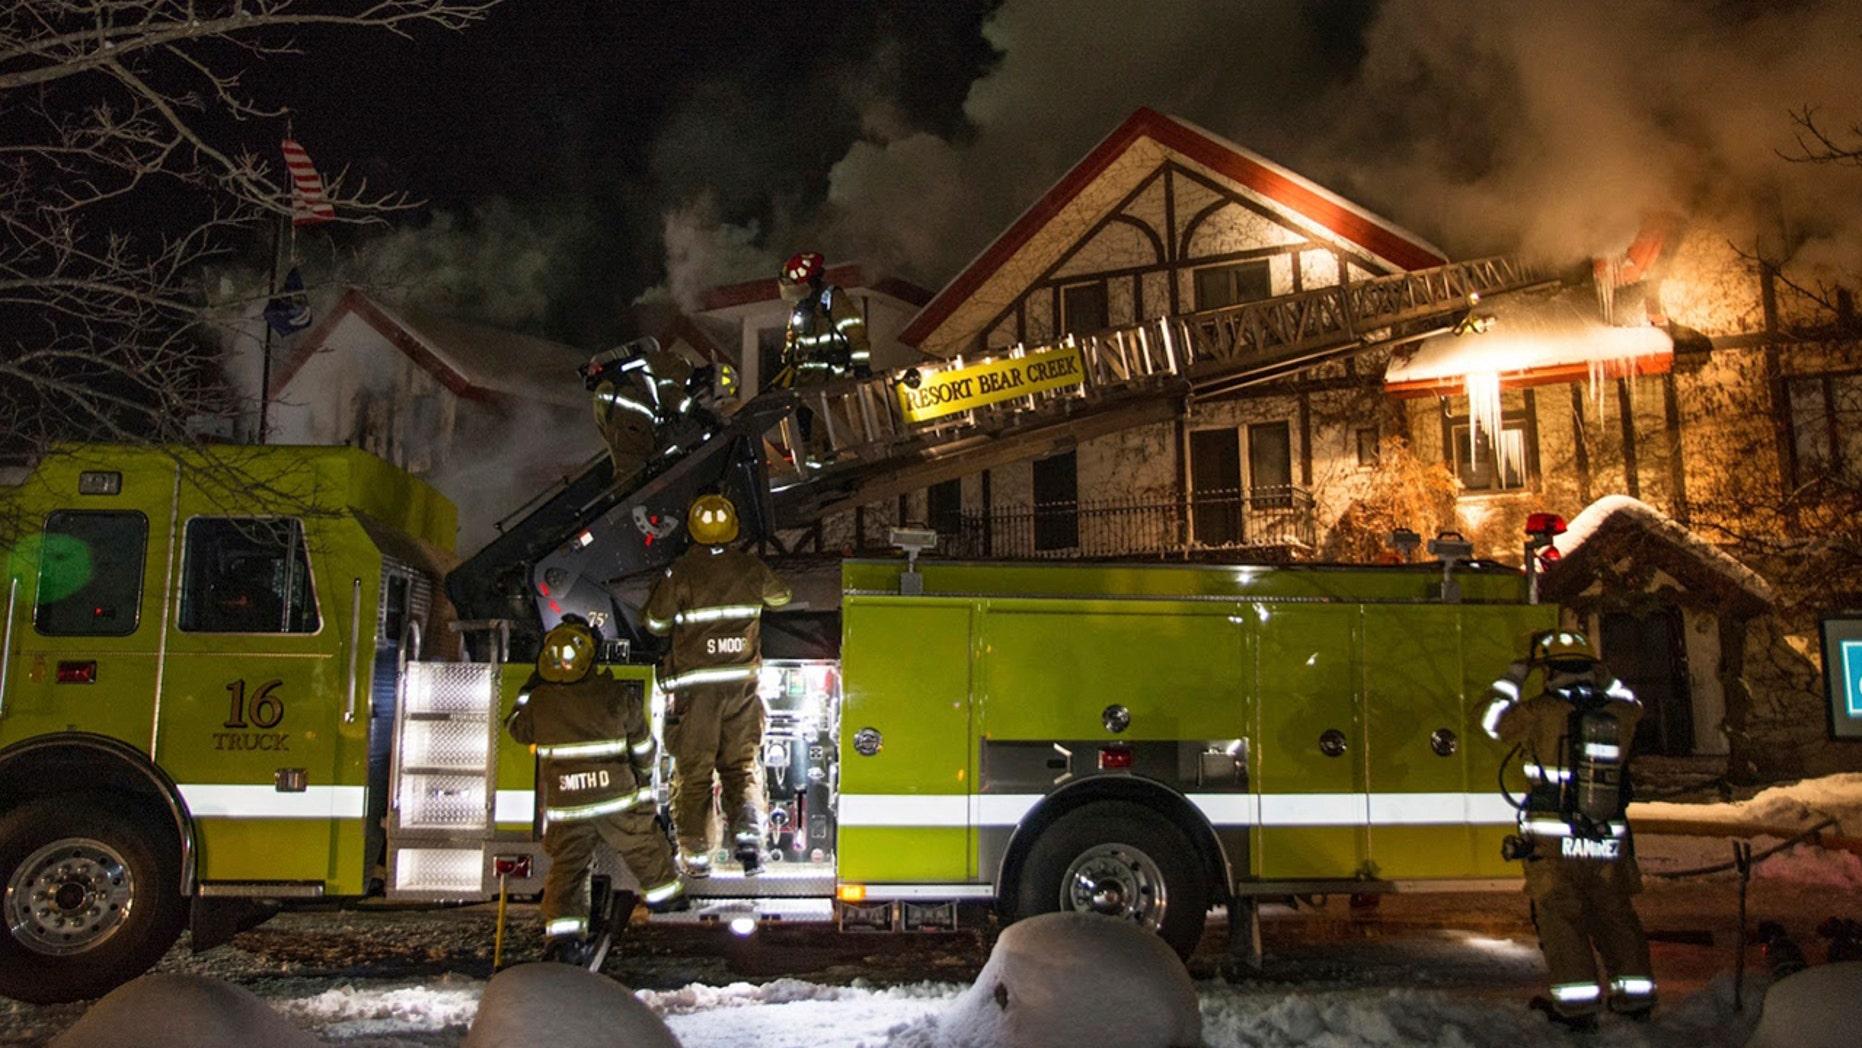 Dec. 11, 2016: Firefighters extinguish a blaze at Boyne Highlands Resort in Harbor Springs, Mich.